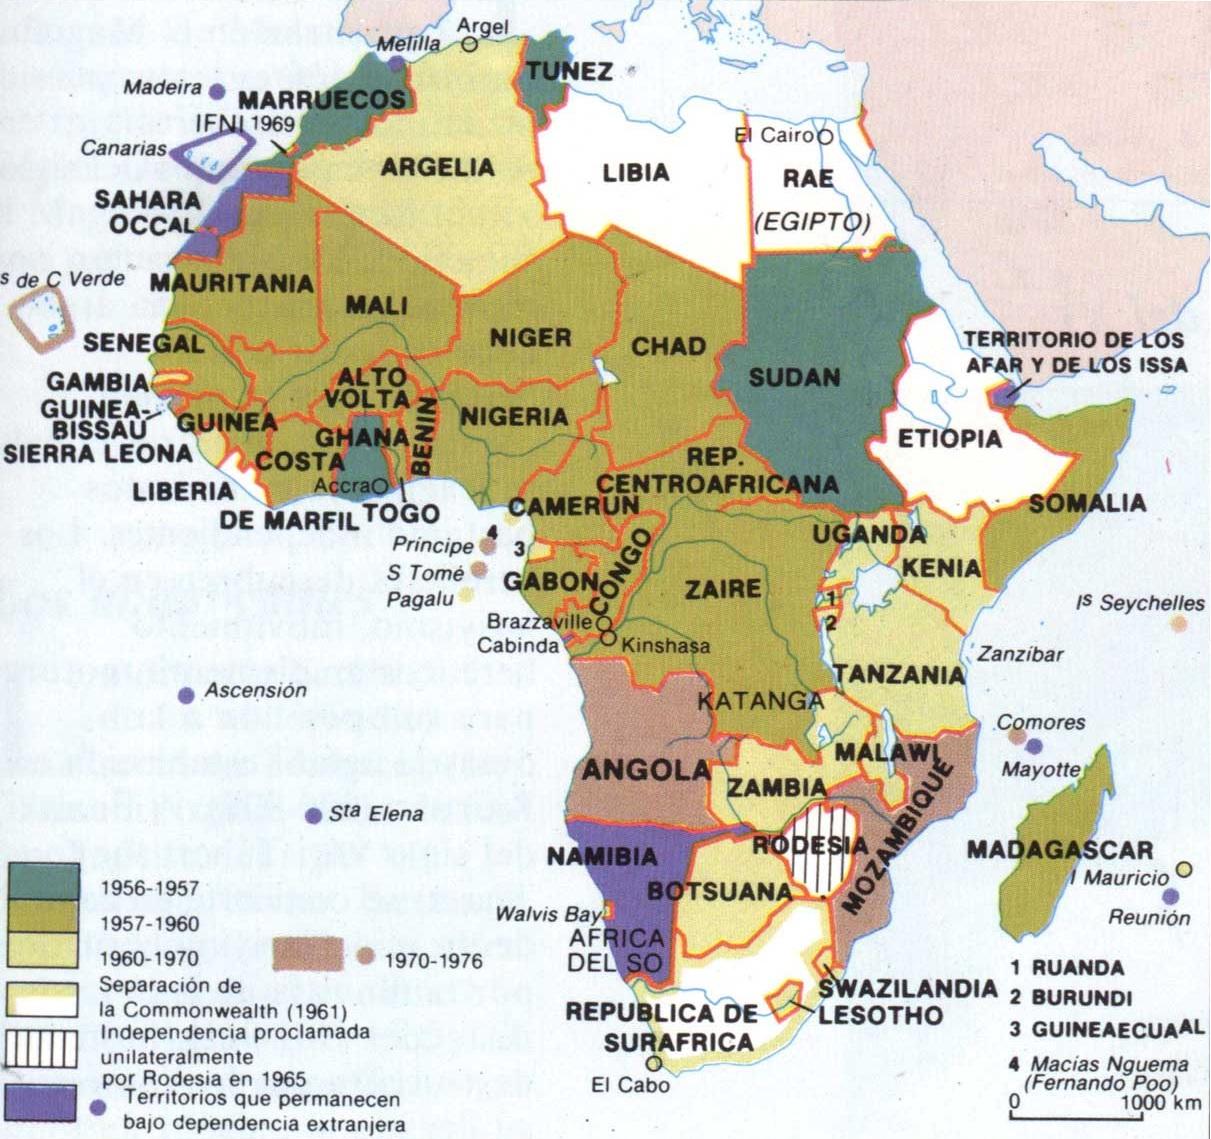 Mapa Politico De Africa Con Sus Paises